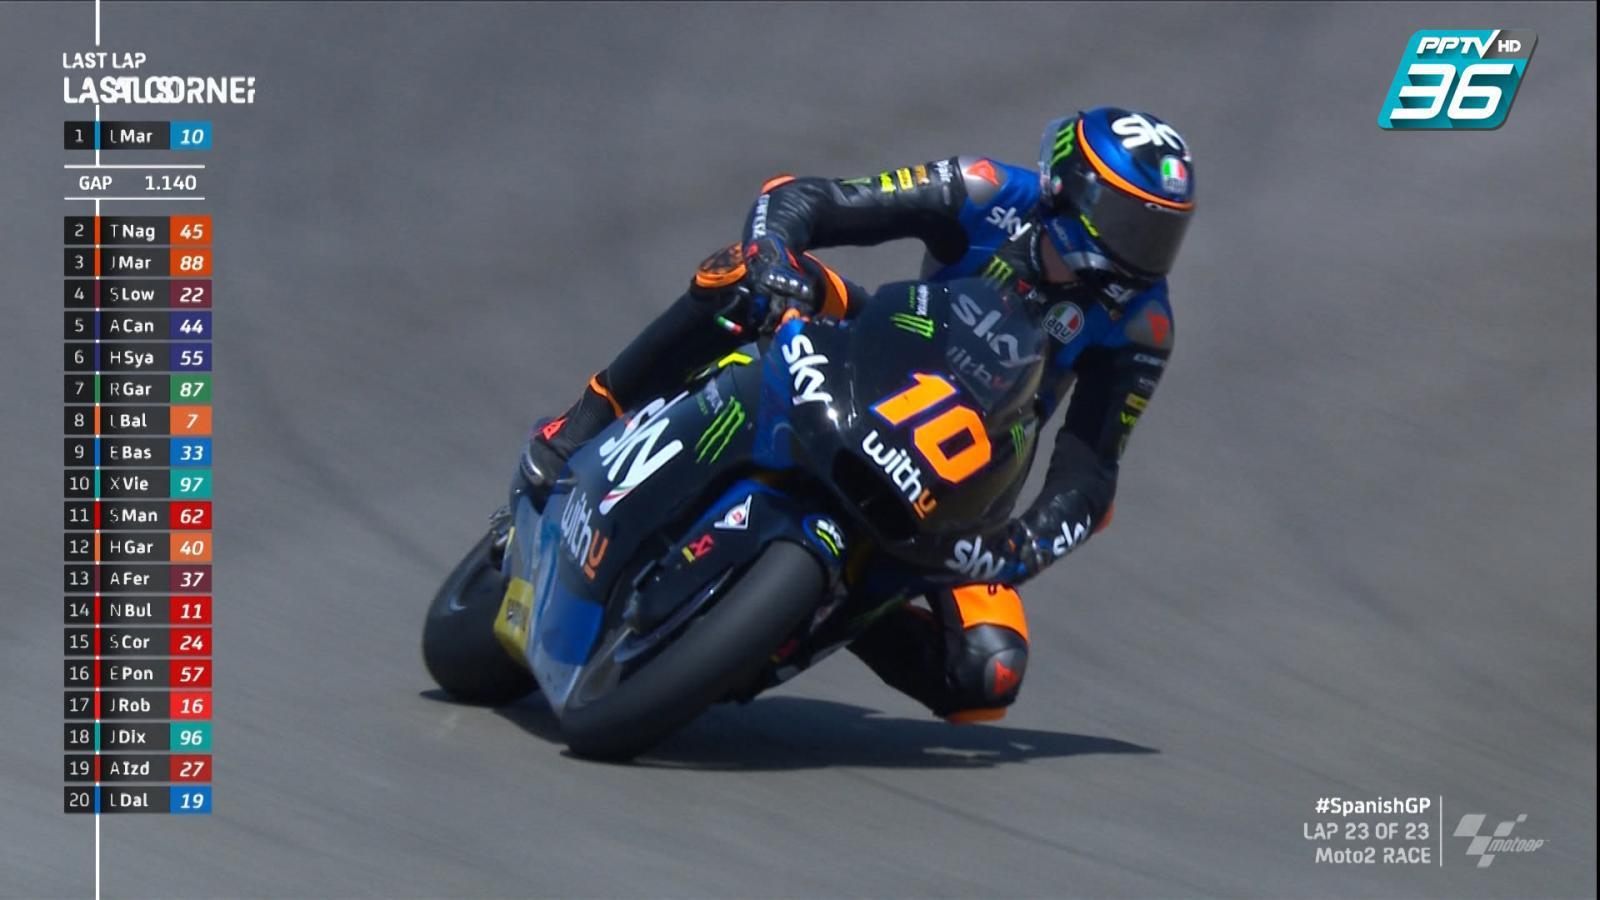 Luca Marini เข้าเส้นชัยที่ 1 ในรุ่น Moto2